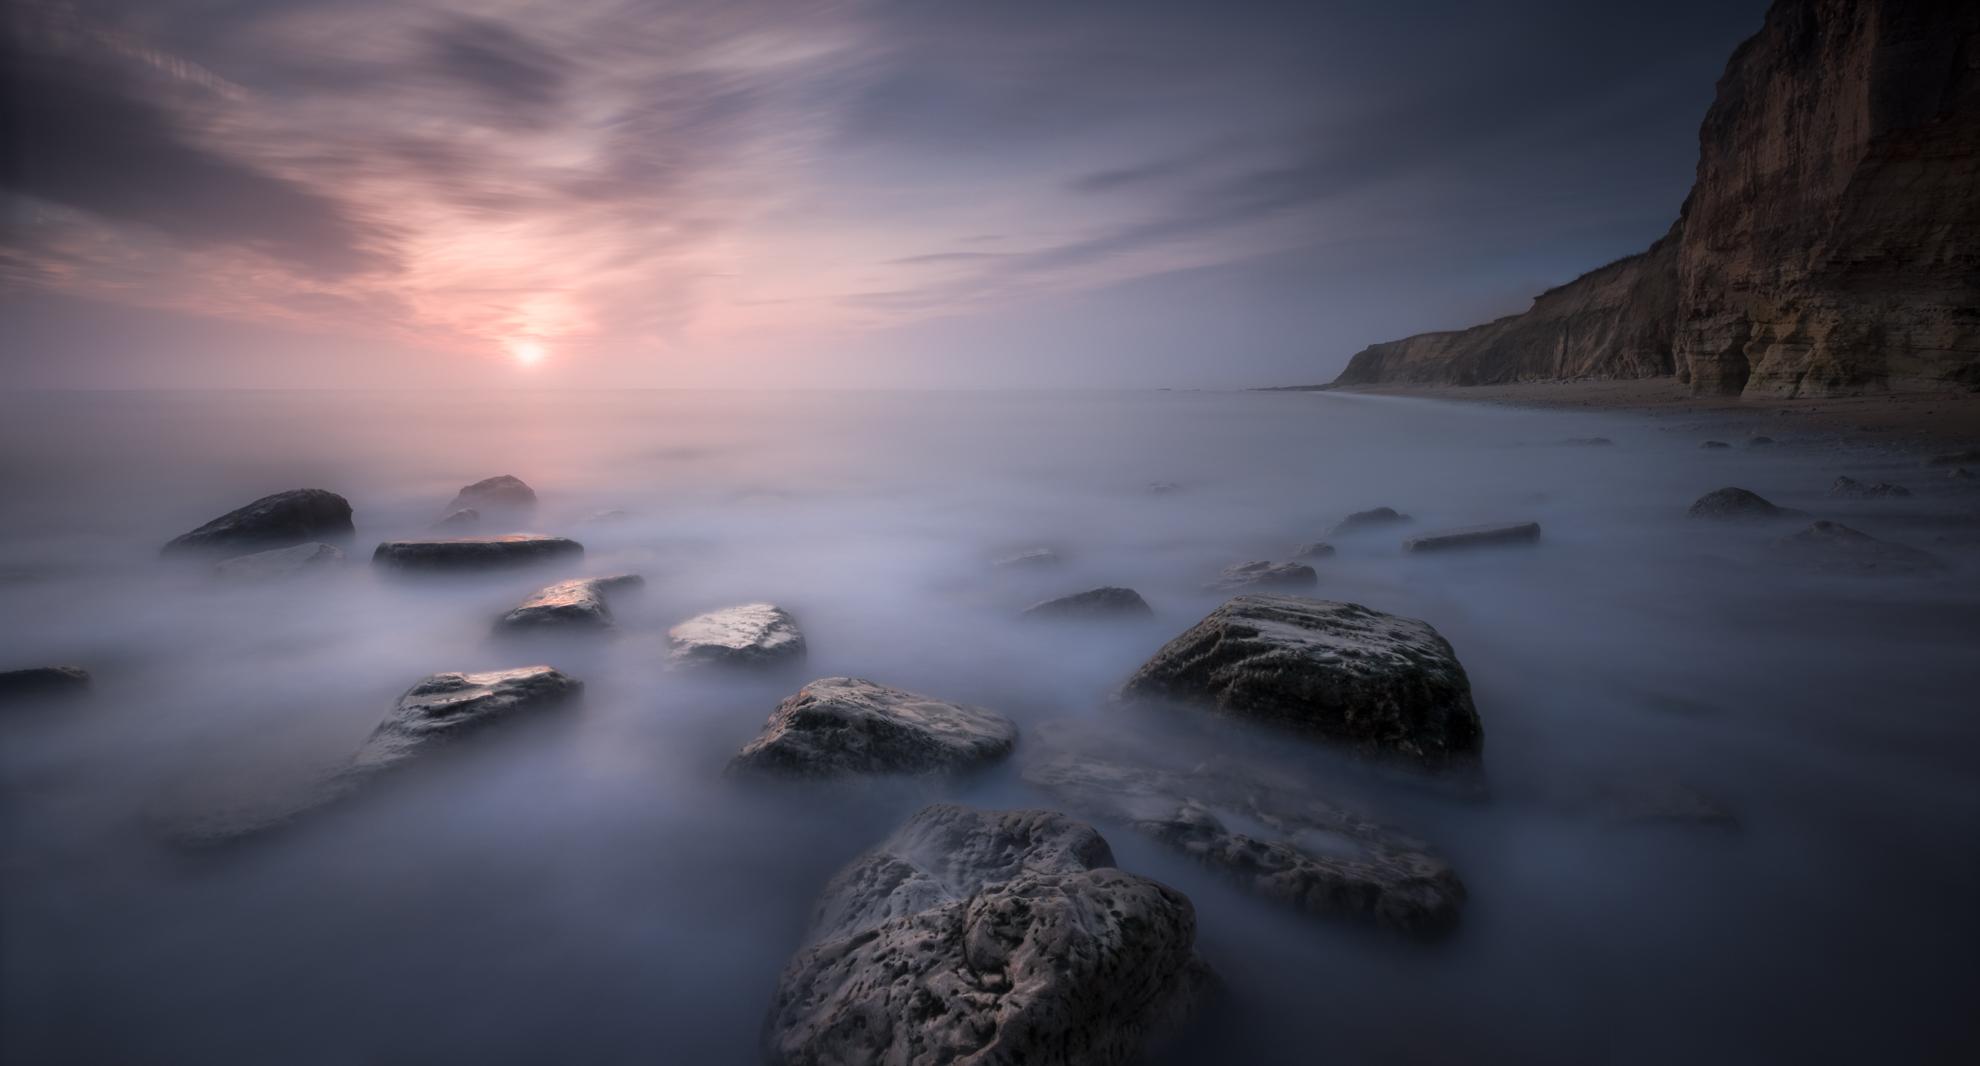 Sunrise near Sunderland, UK